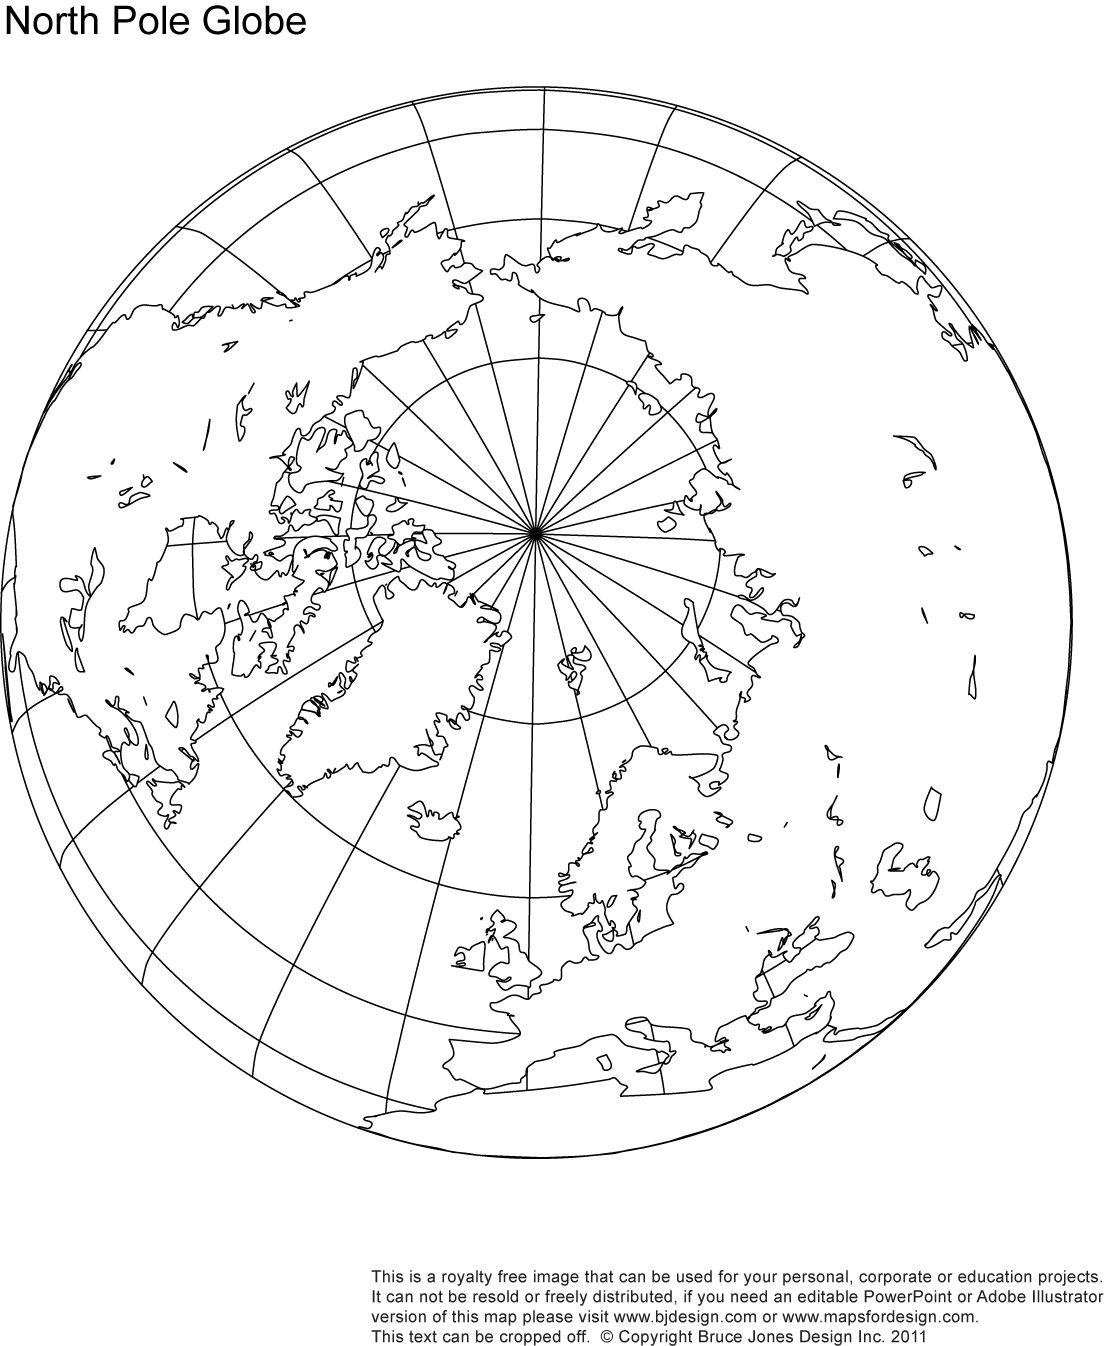 North Pole Globe Map, royalty free.